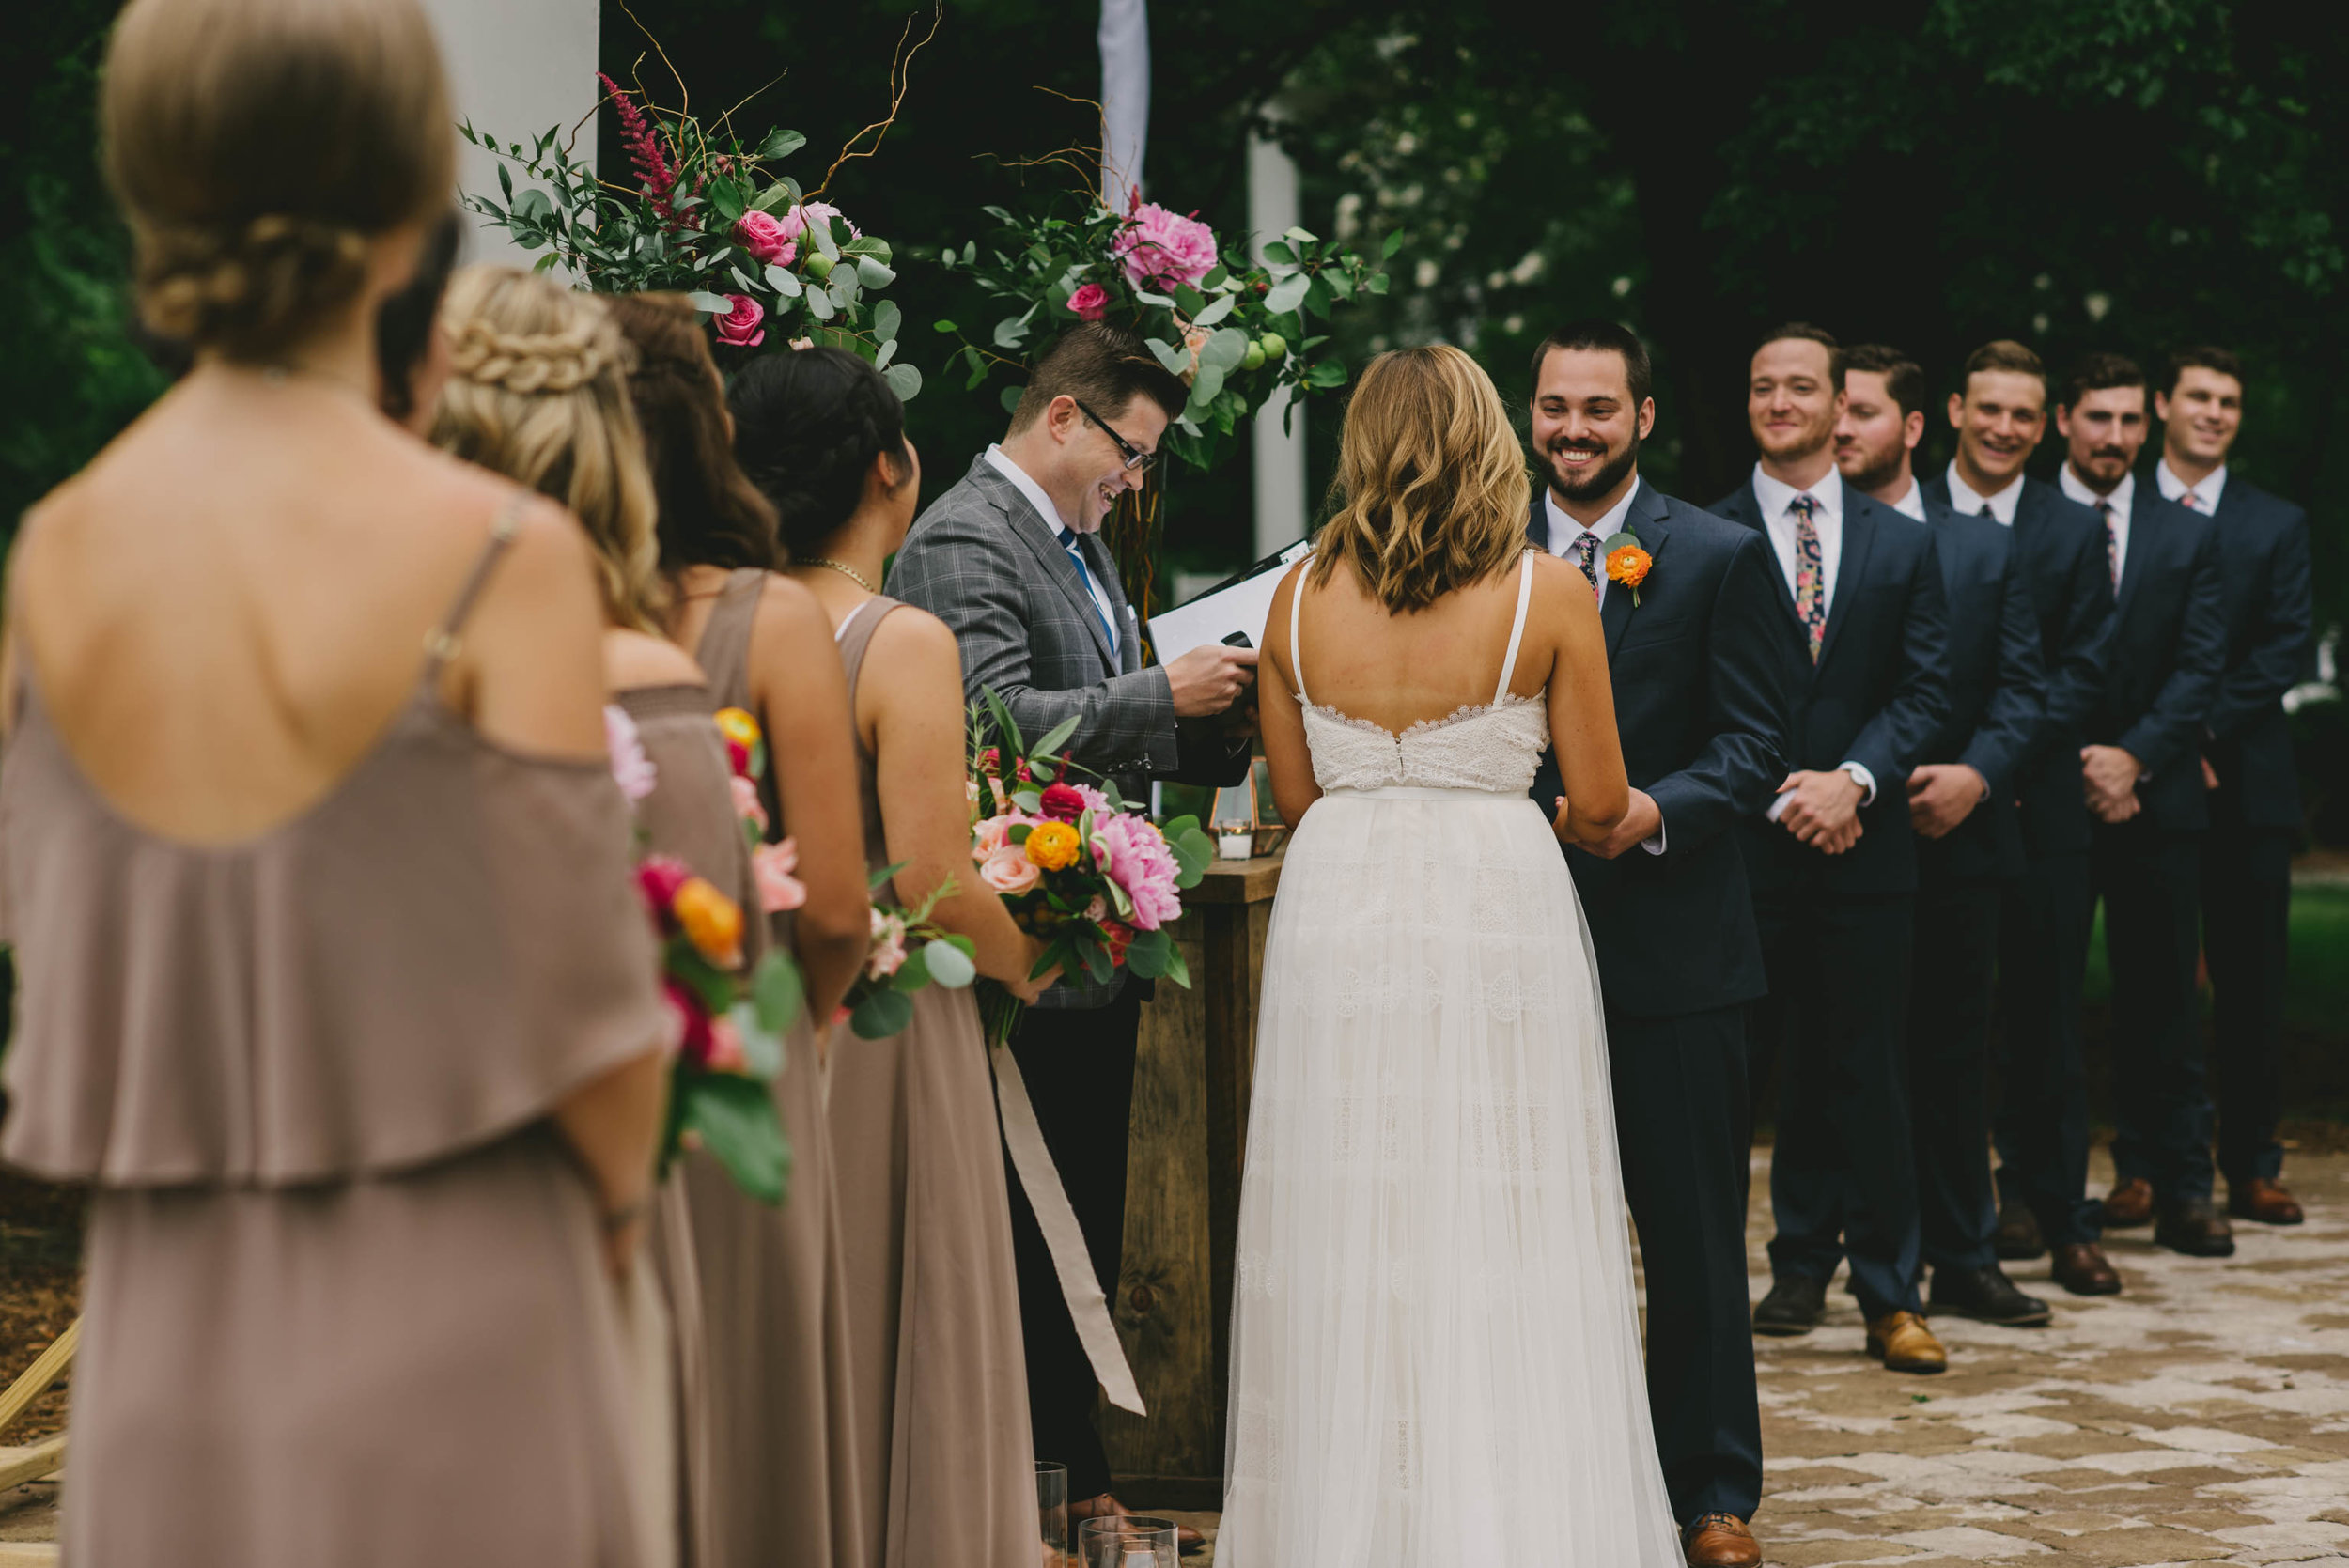 mims-house-wedding-ceremony-photos.jpg